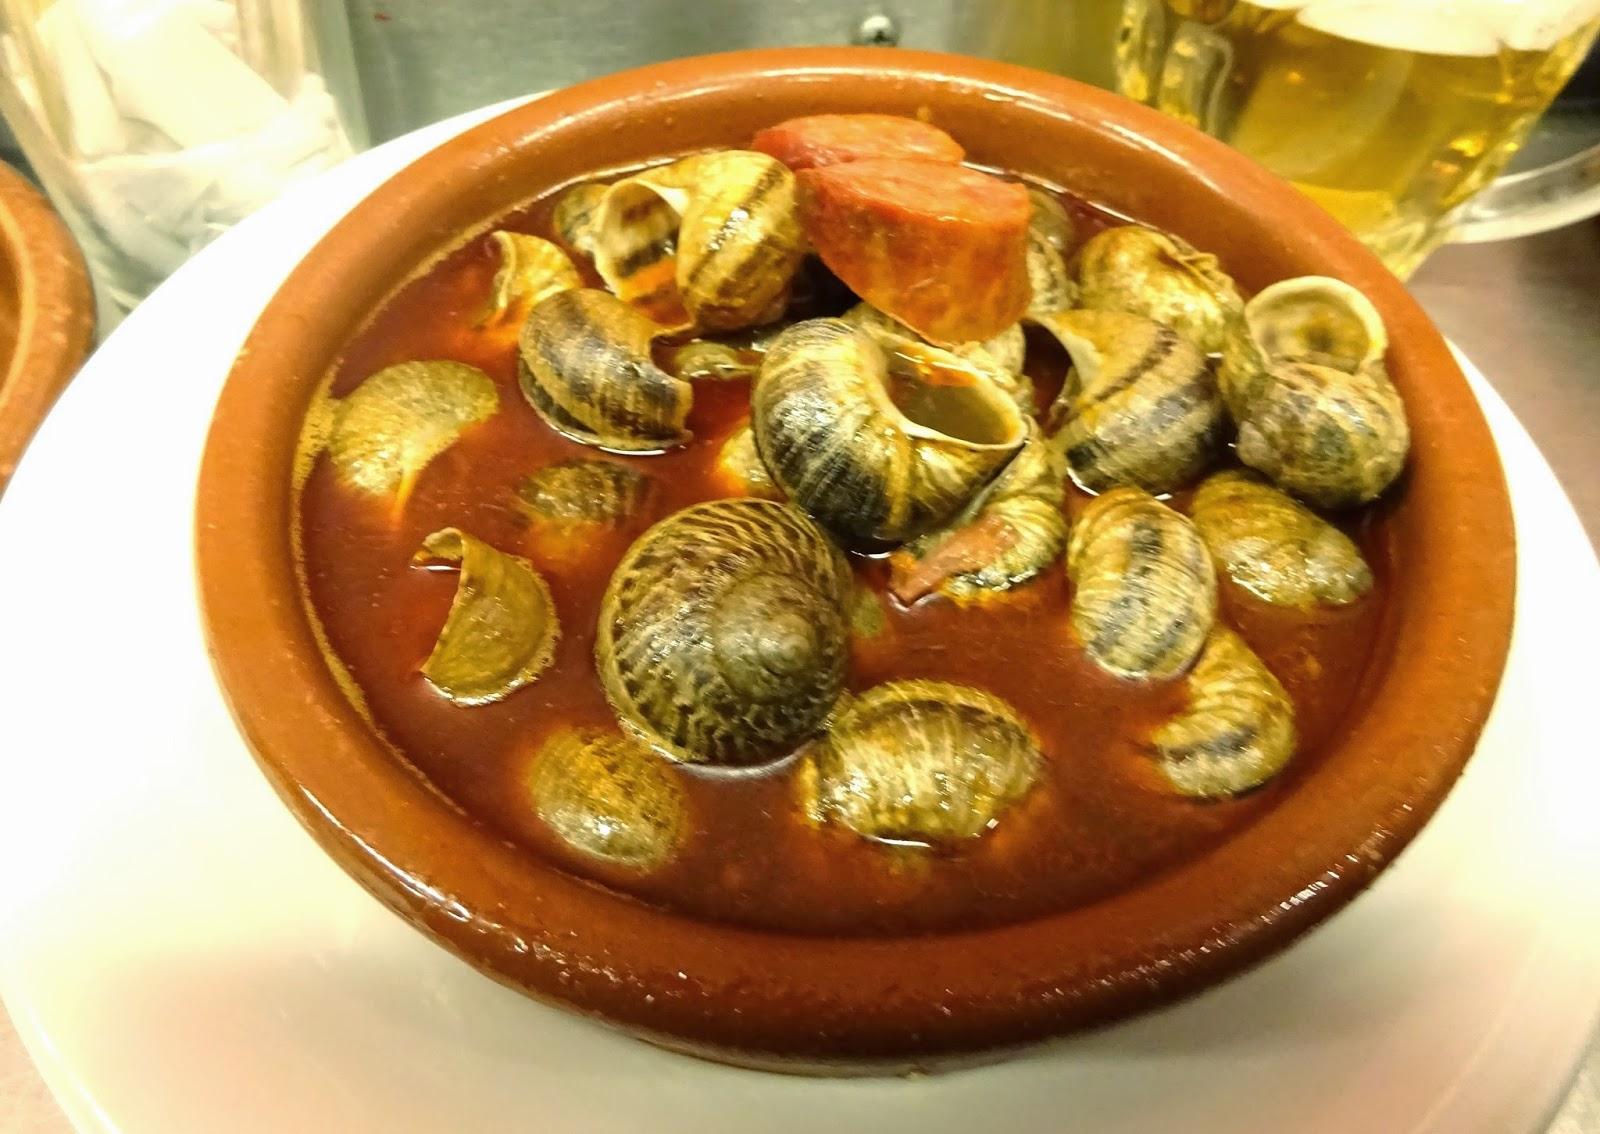 la latina rastro tapeo domingo Madrid cañas caracoles la china mandarina bares tabernas